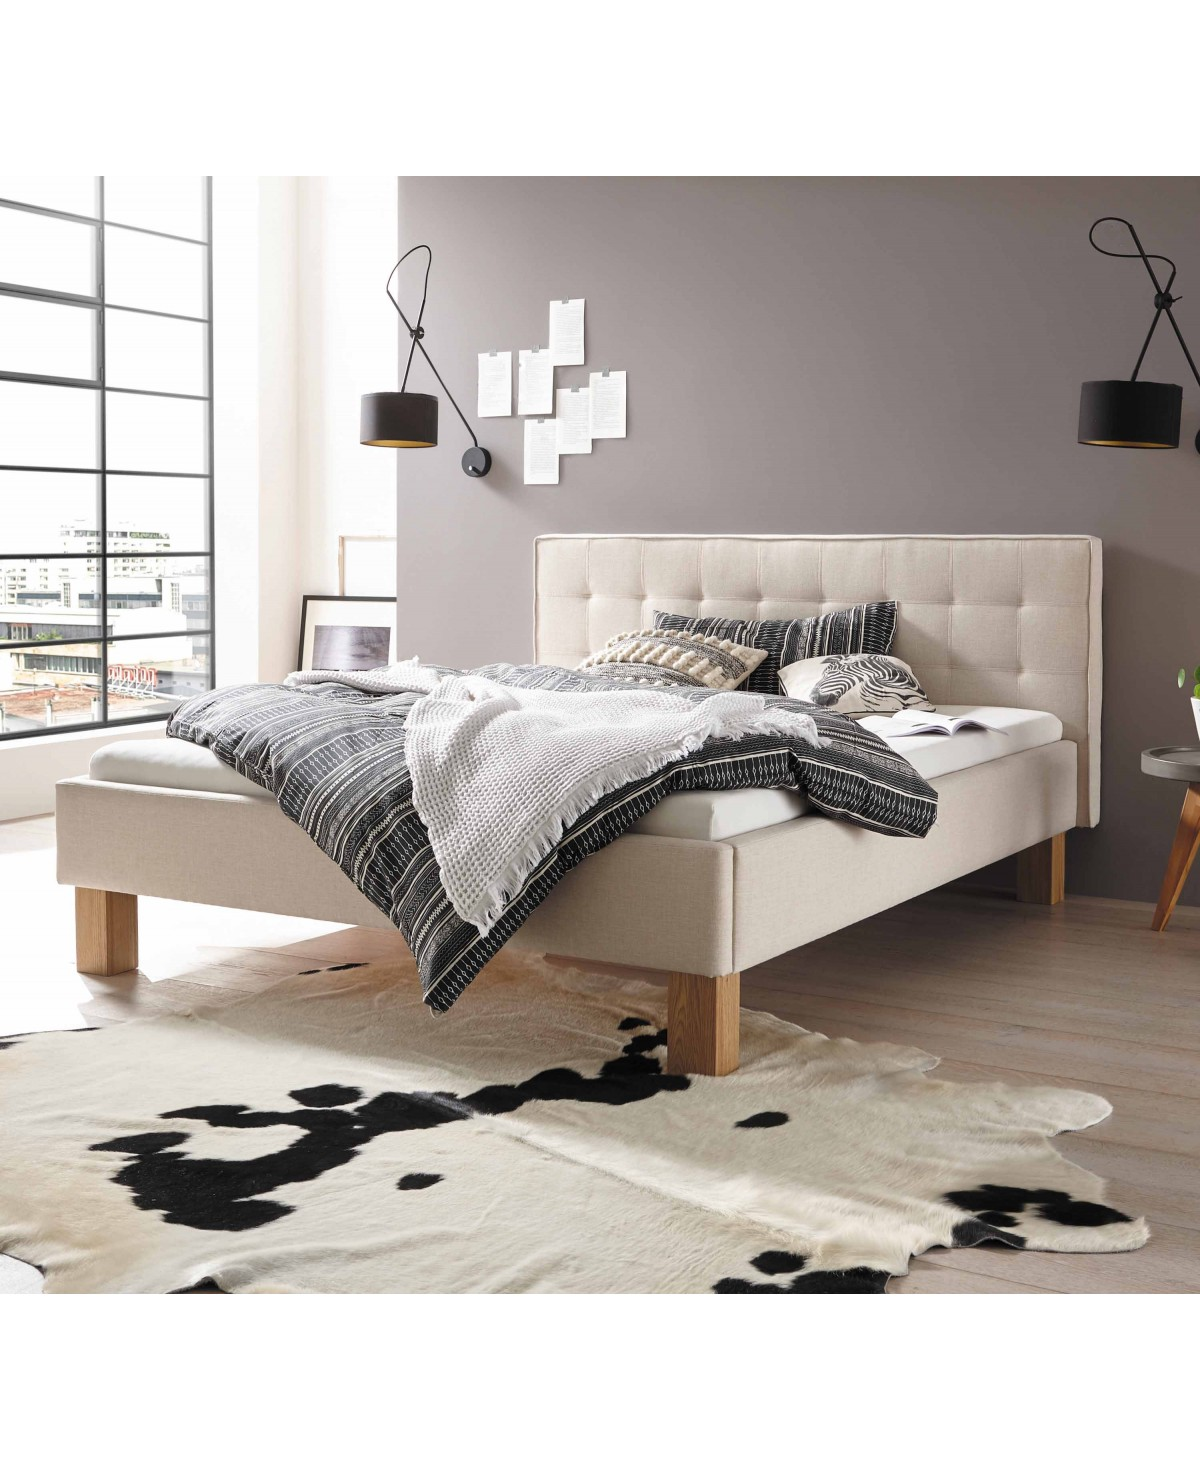 Full Size of Polsterbett 200x220 Hasena Dream Line Noemi 20 Eiche Bianco Stoff Beige Betten Bett Wohnzimmer Polsterbett 200x220